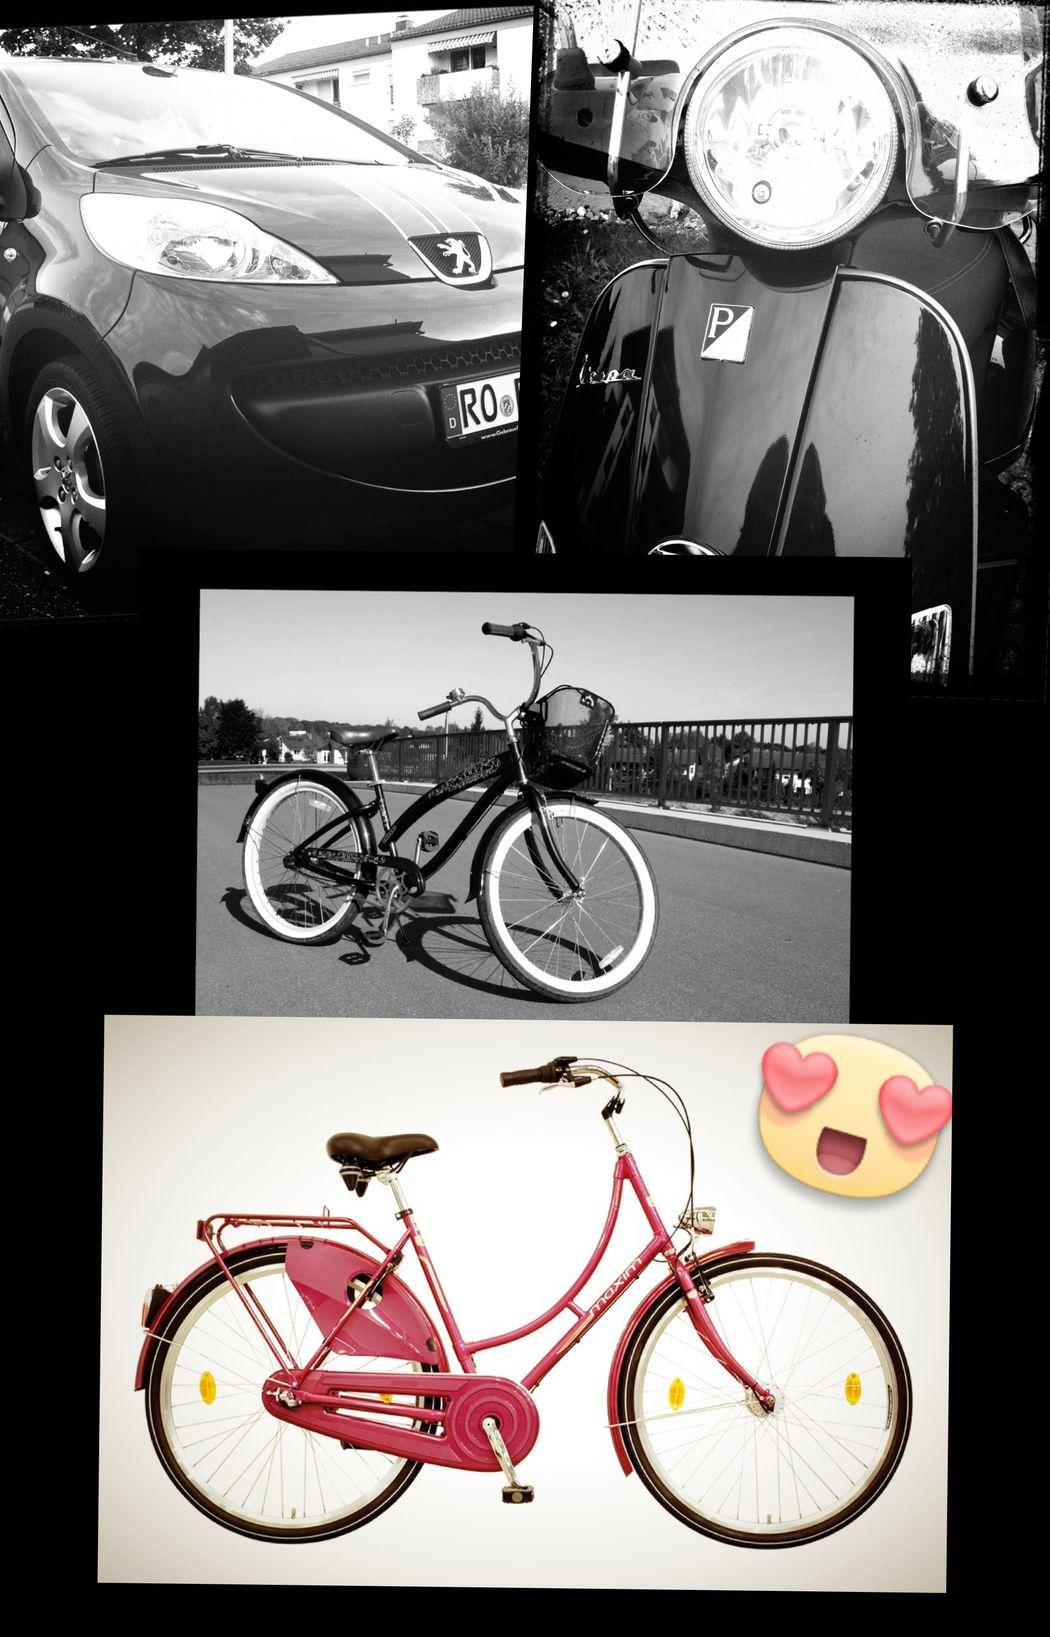 ... my Car, my Vespa, my Bikes ❤️❤️❤️❤️